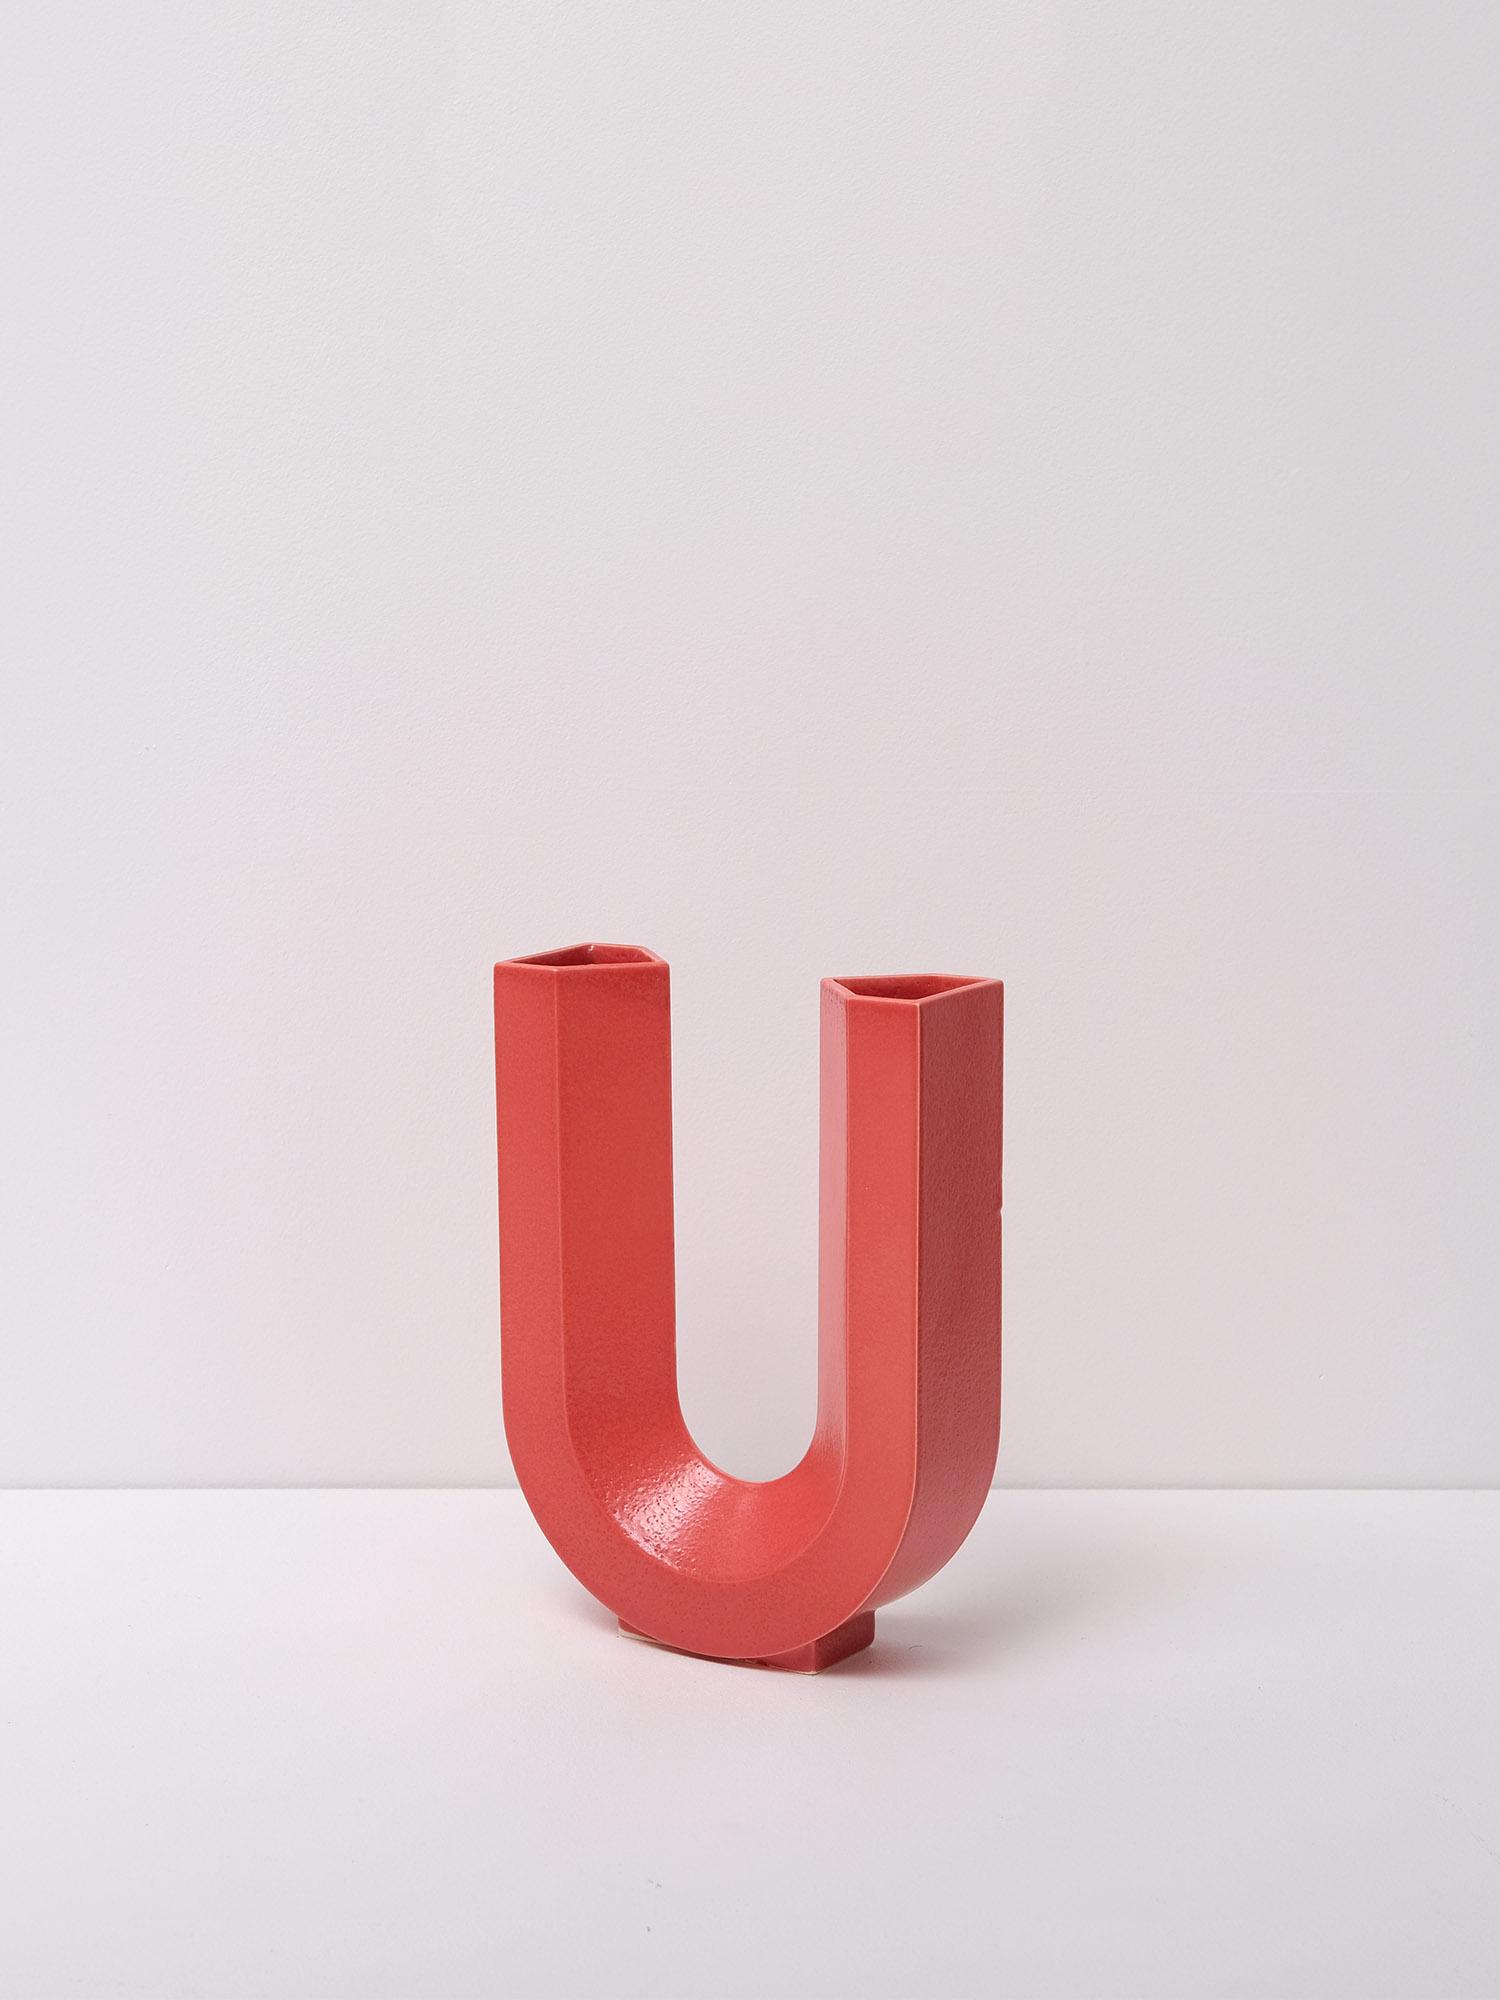 Rhys Cooper has released his first ceramic series 'U Vase' - Local